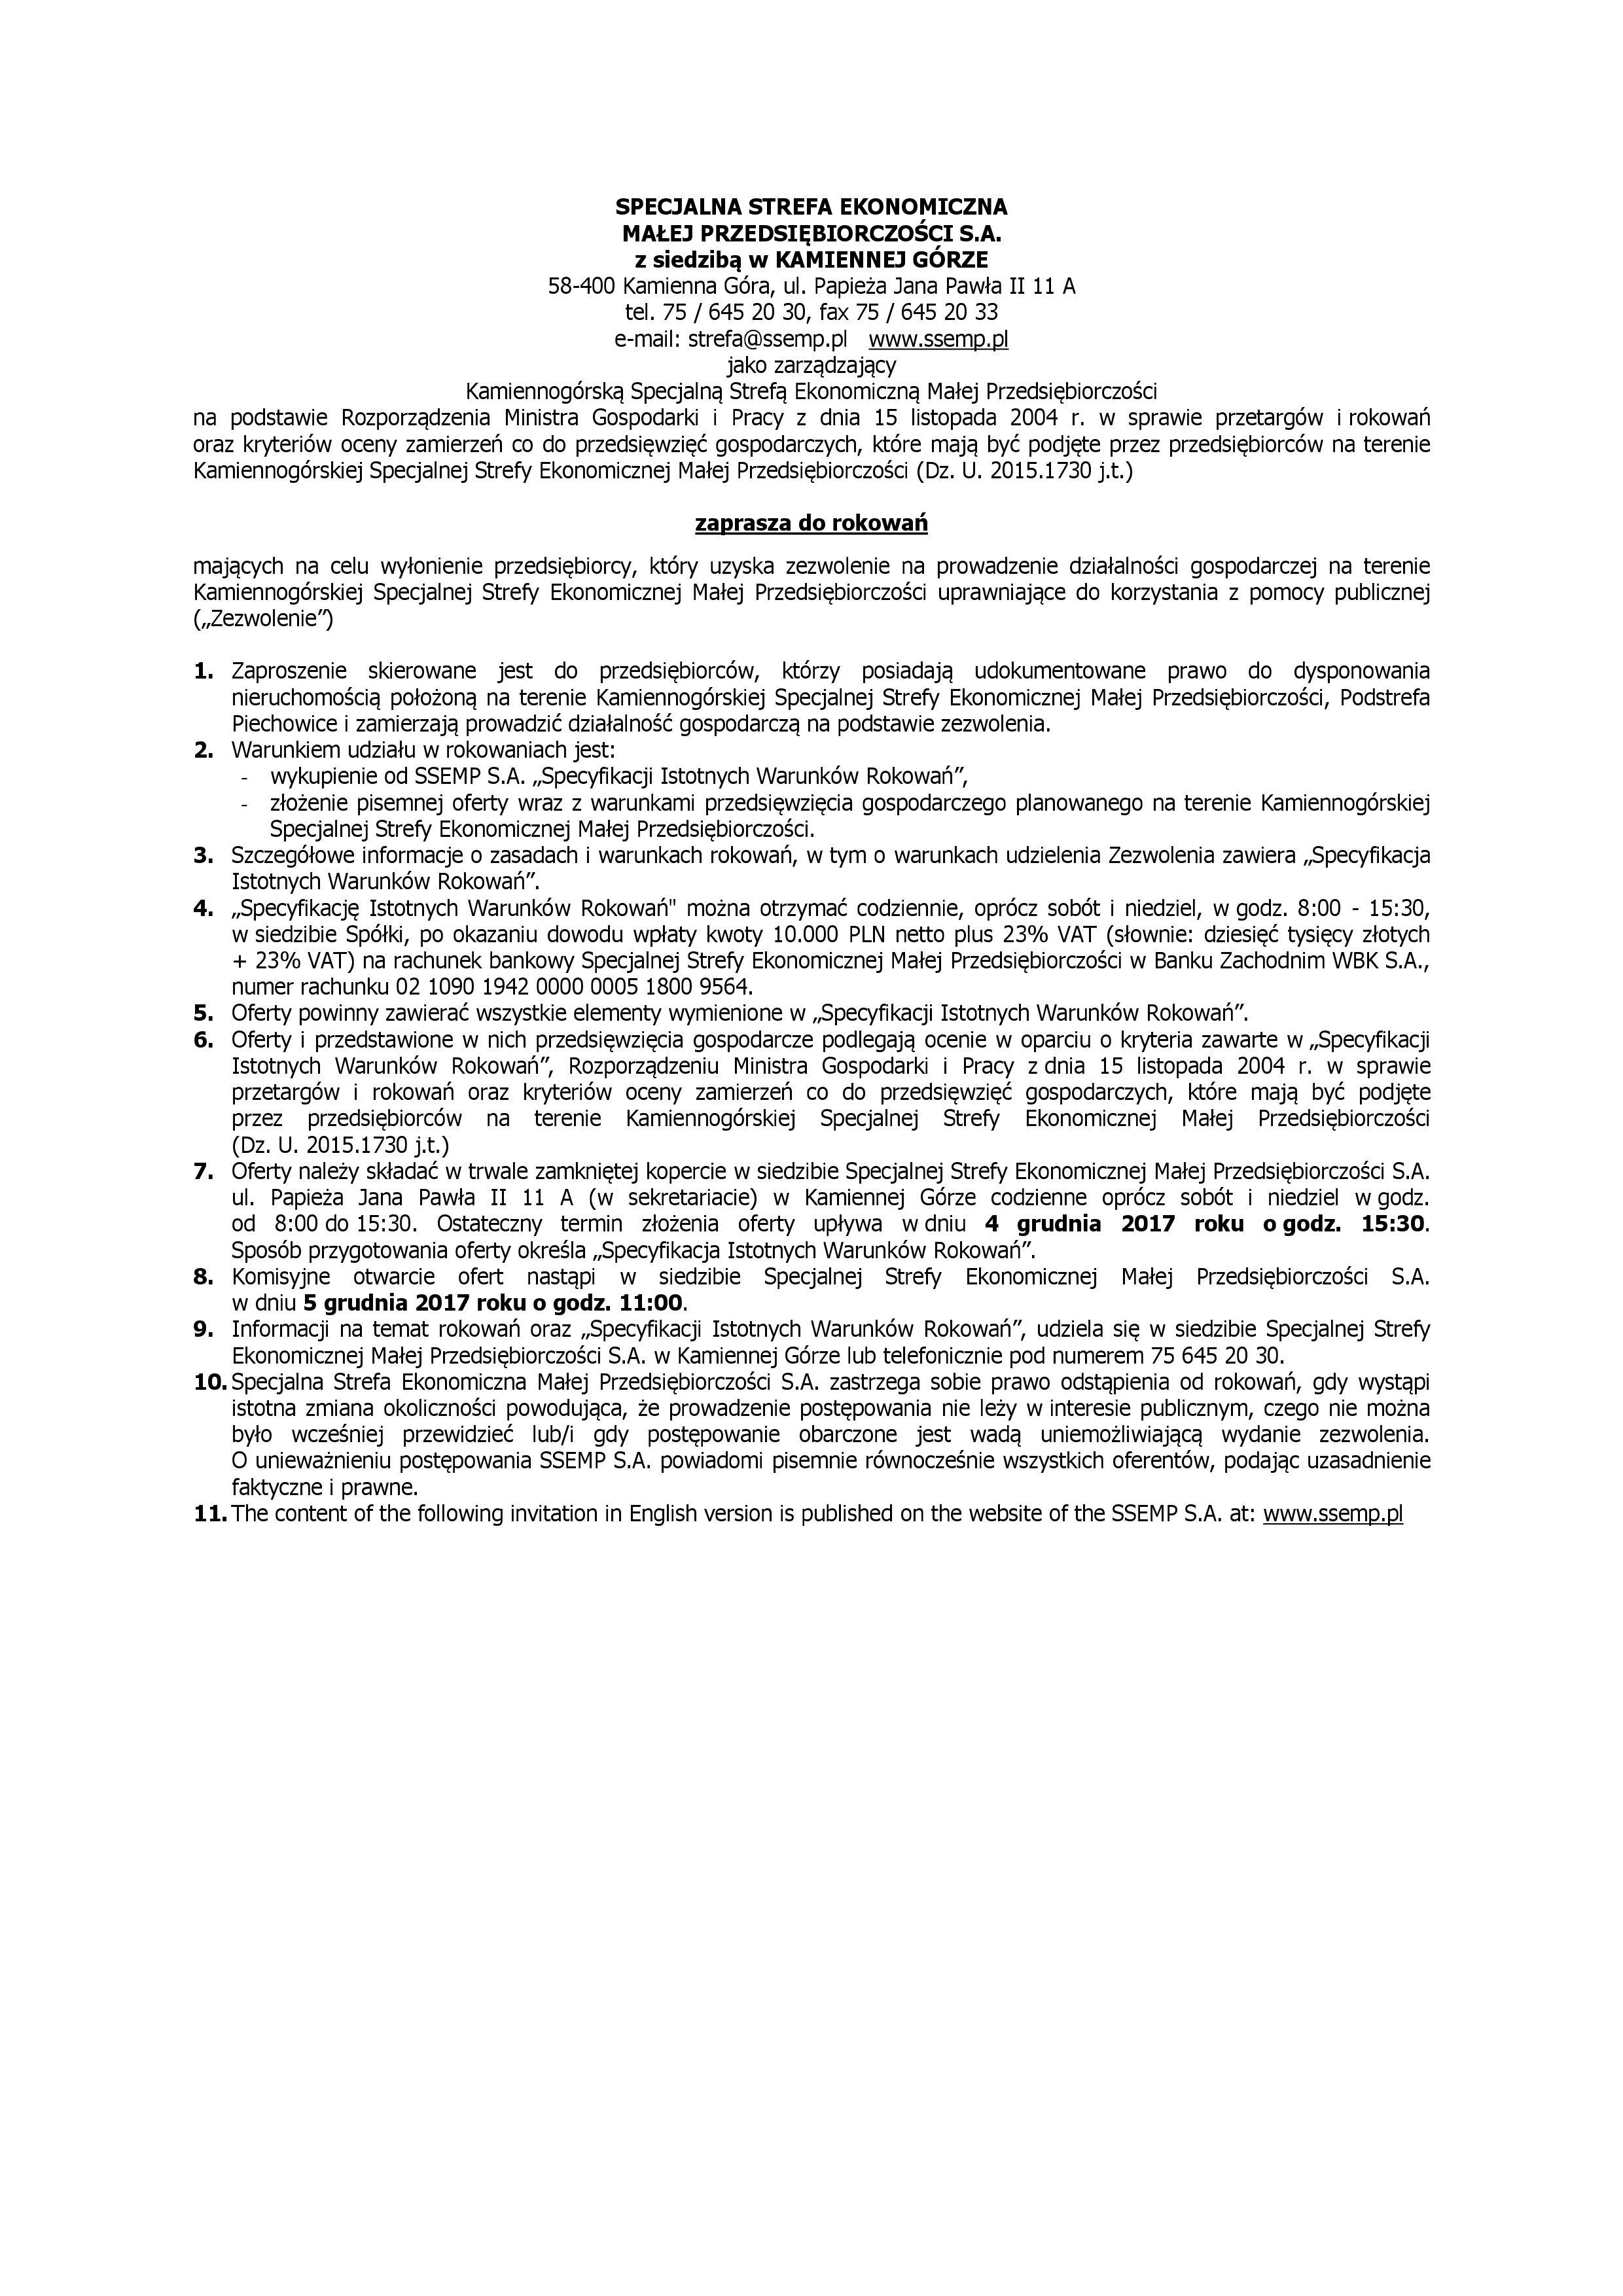 Piechowice - 13.11.2017 pl